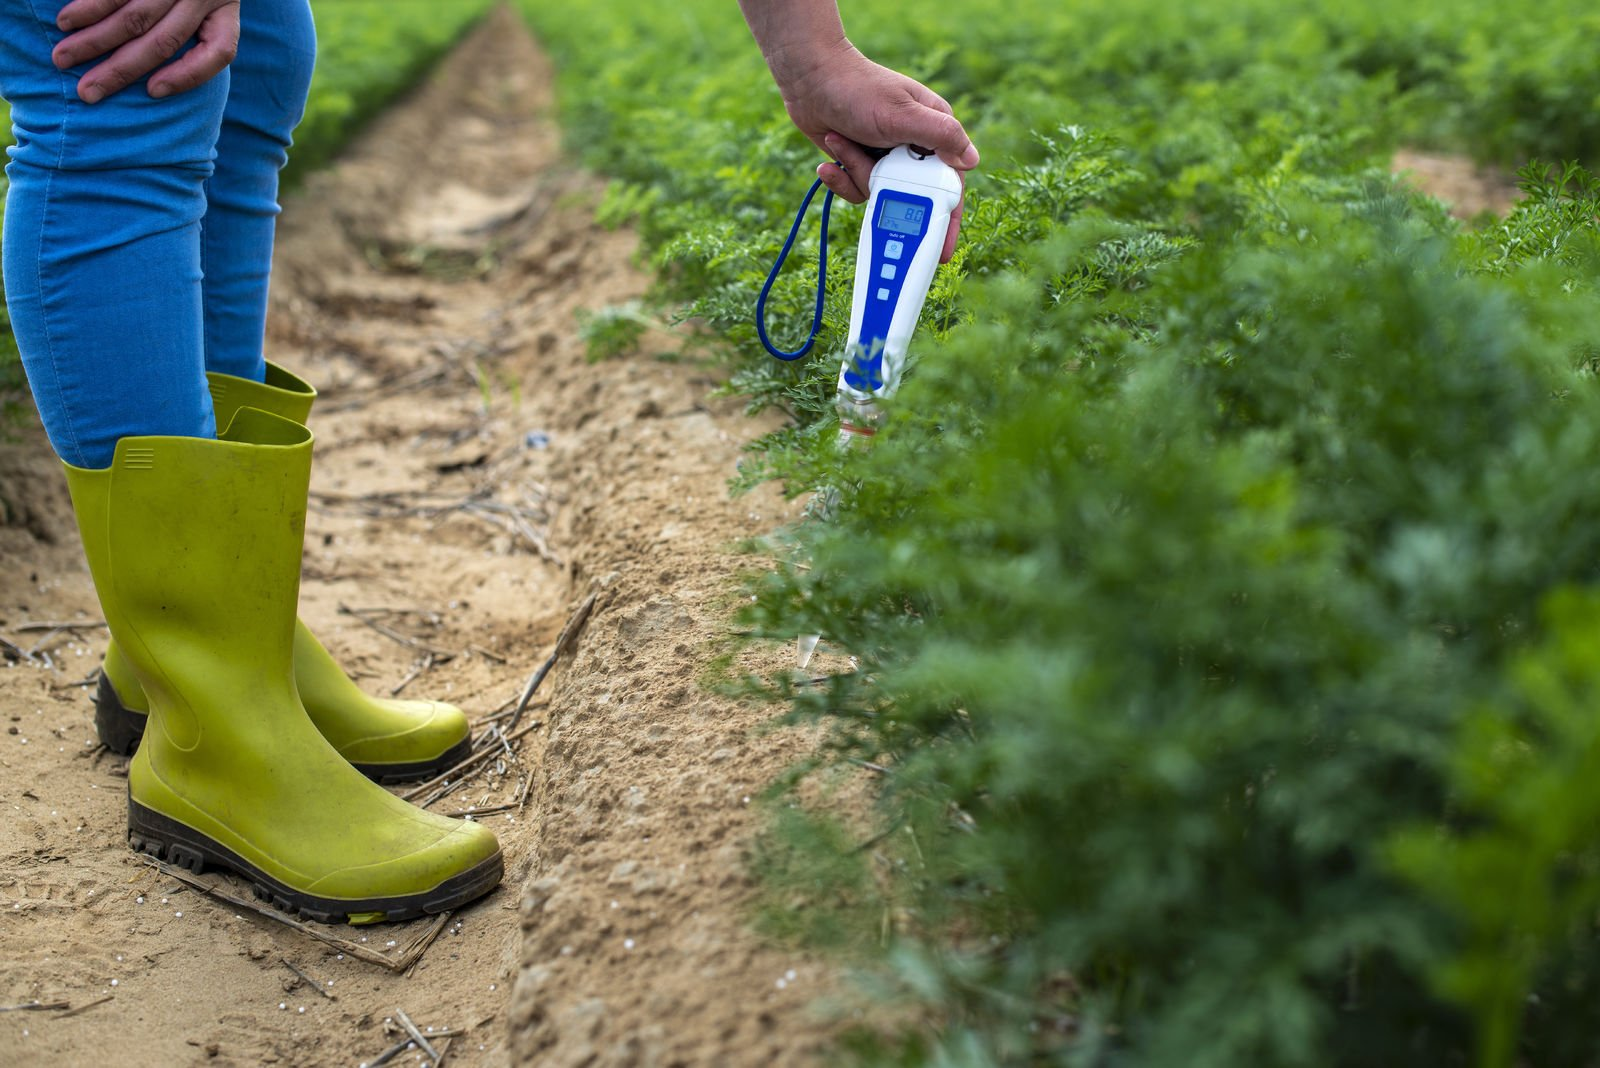 Measuring pH with a Bluelab Soil pH Pen